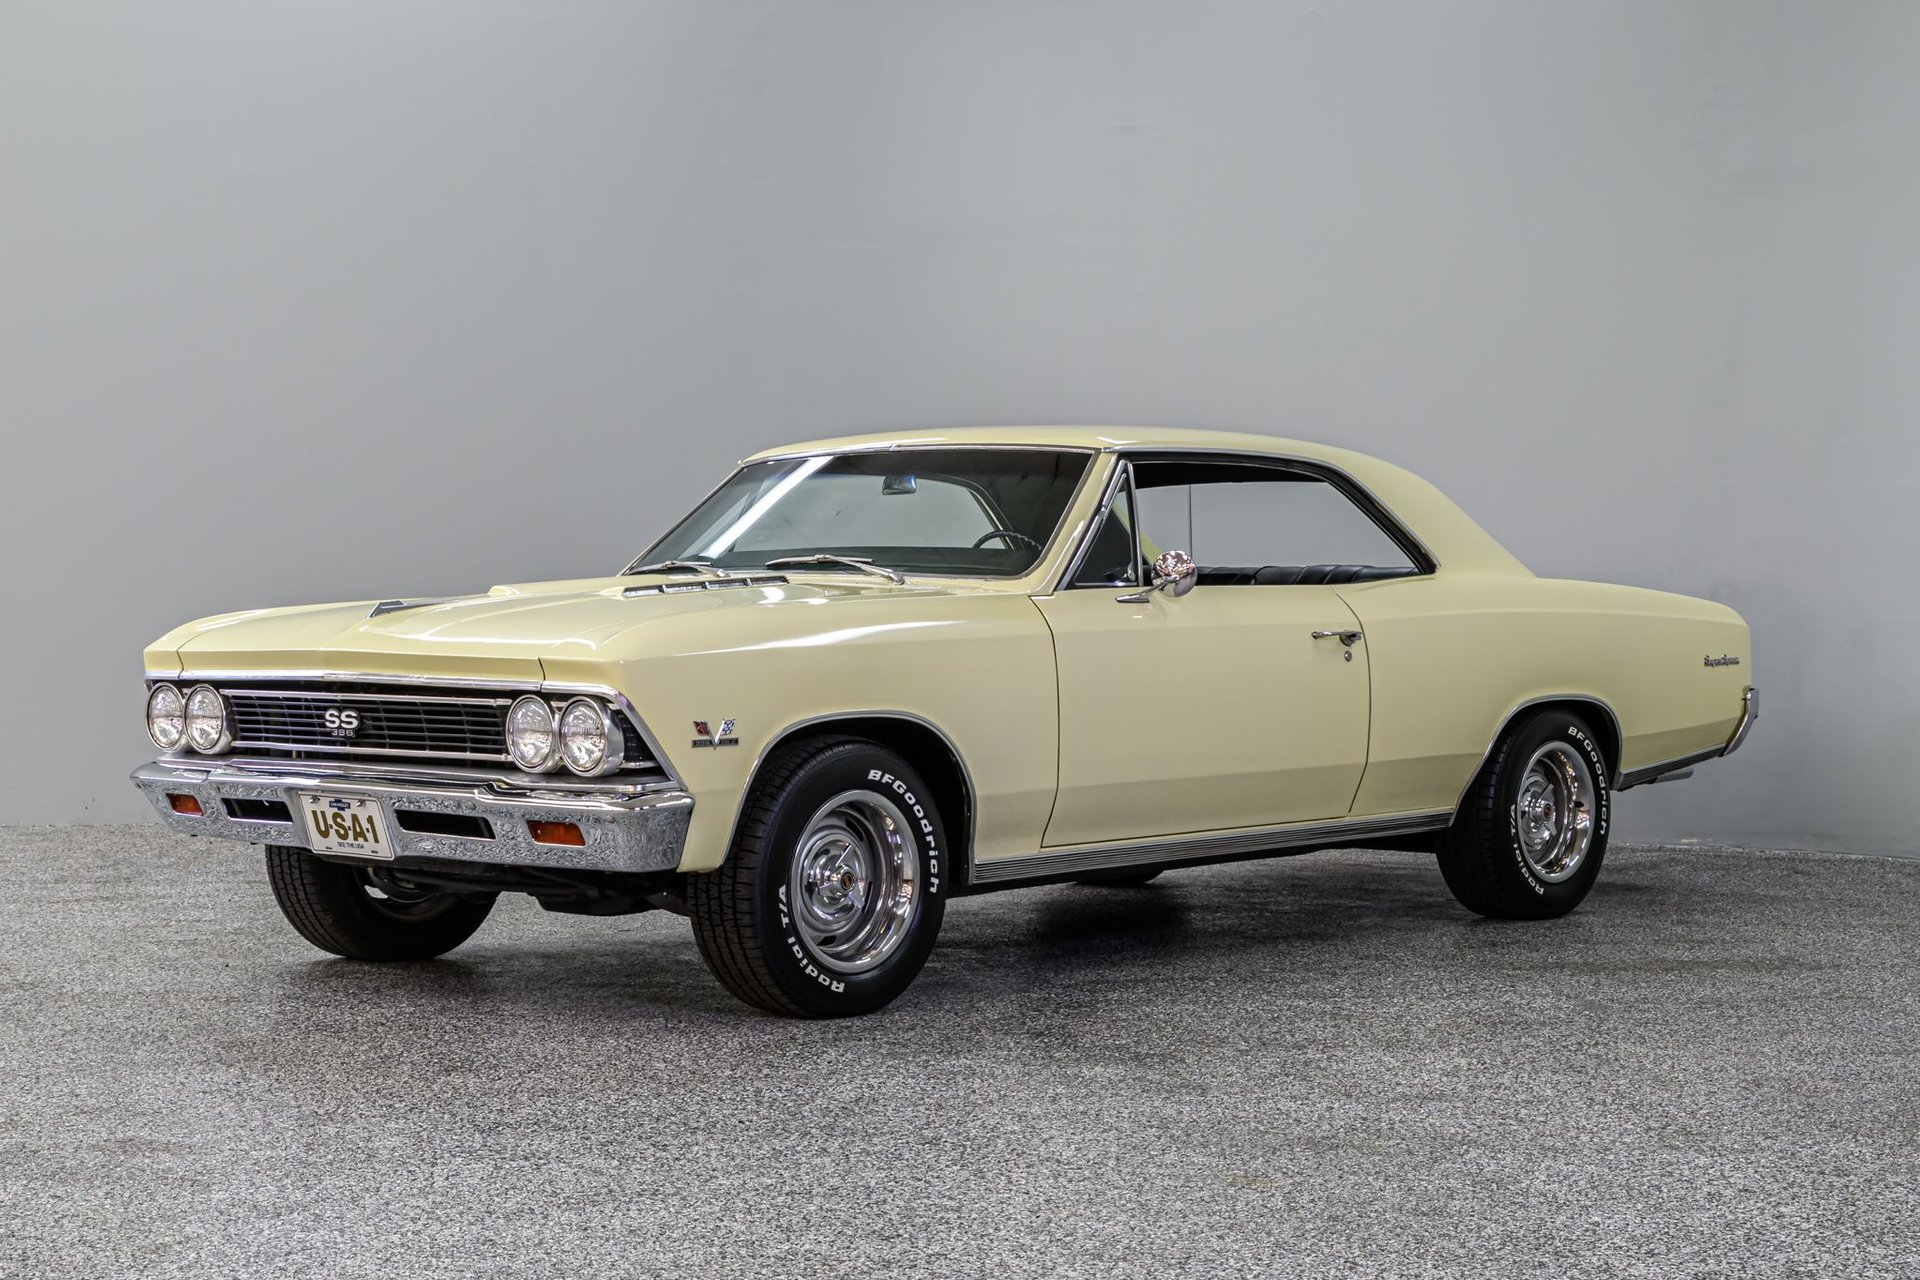 1966 chevrolet chevelle ss 396 tribute